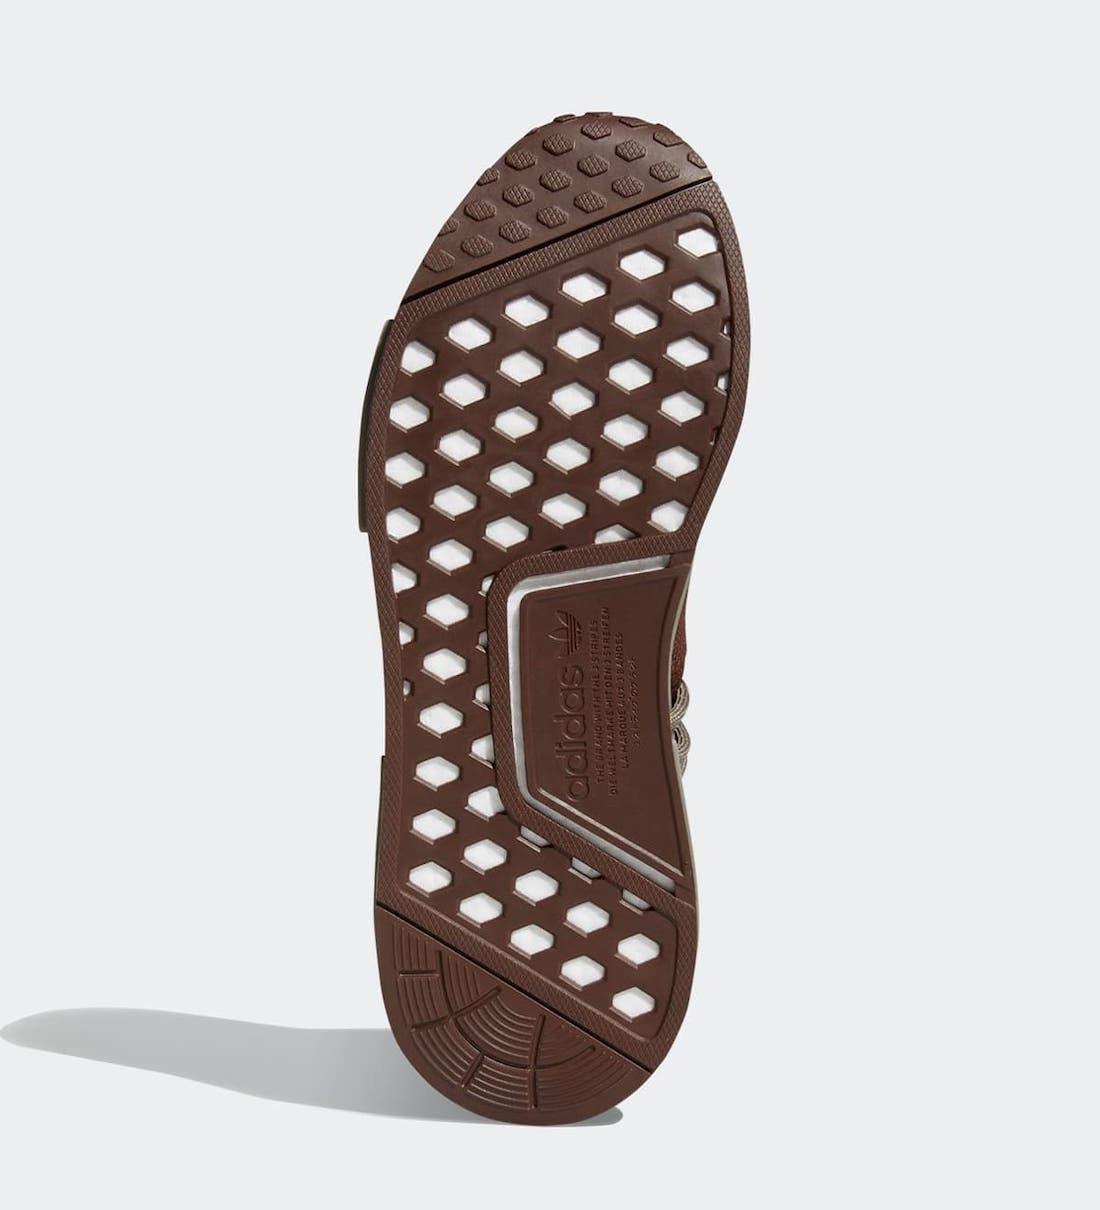 Pharrell x adidas NMD Hu 'Chocolate' GY0090 5